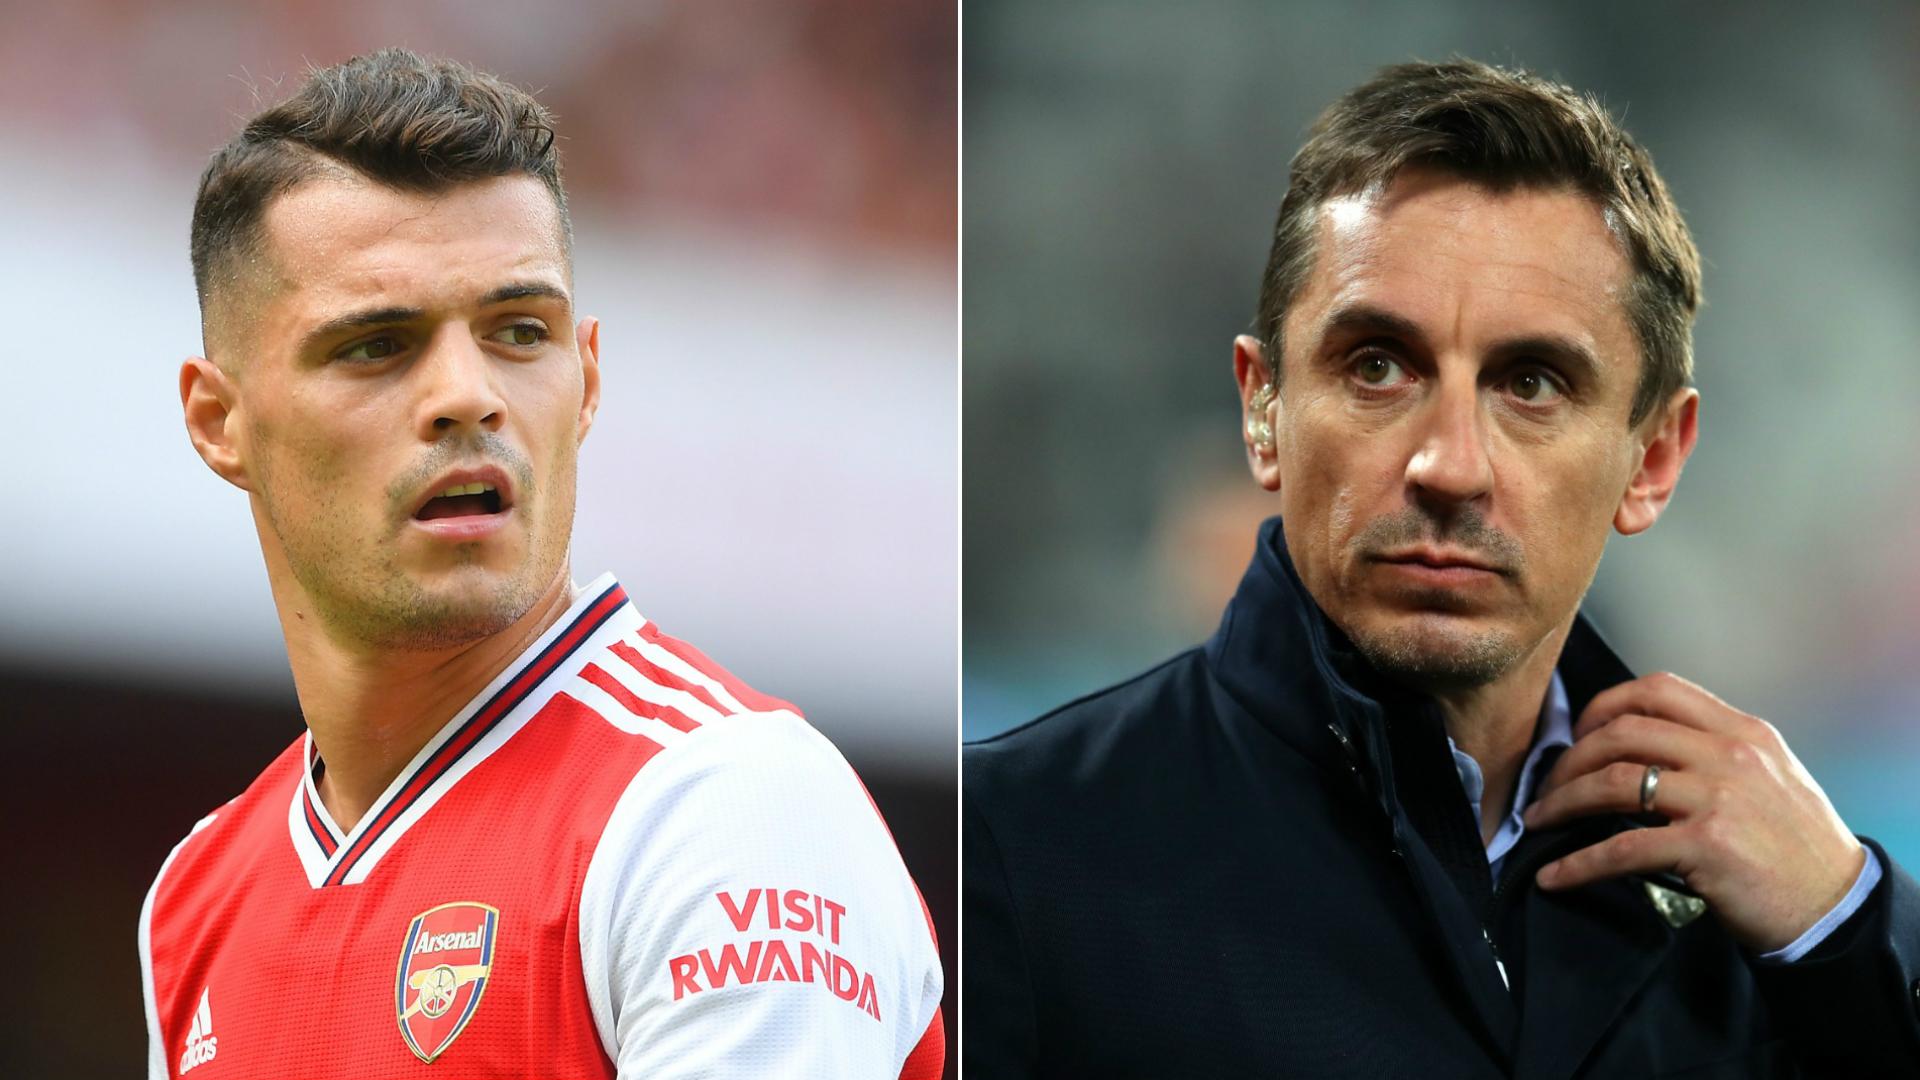 Arsenal midfielder Xhaka must be willing to accept fan criticism - Neville